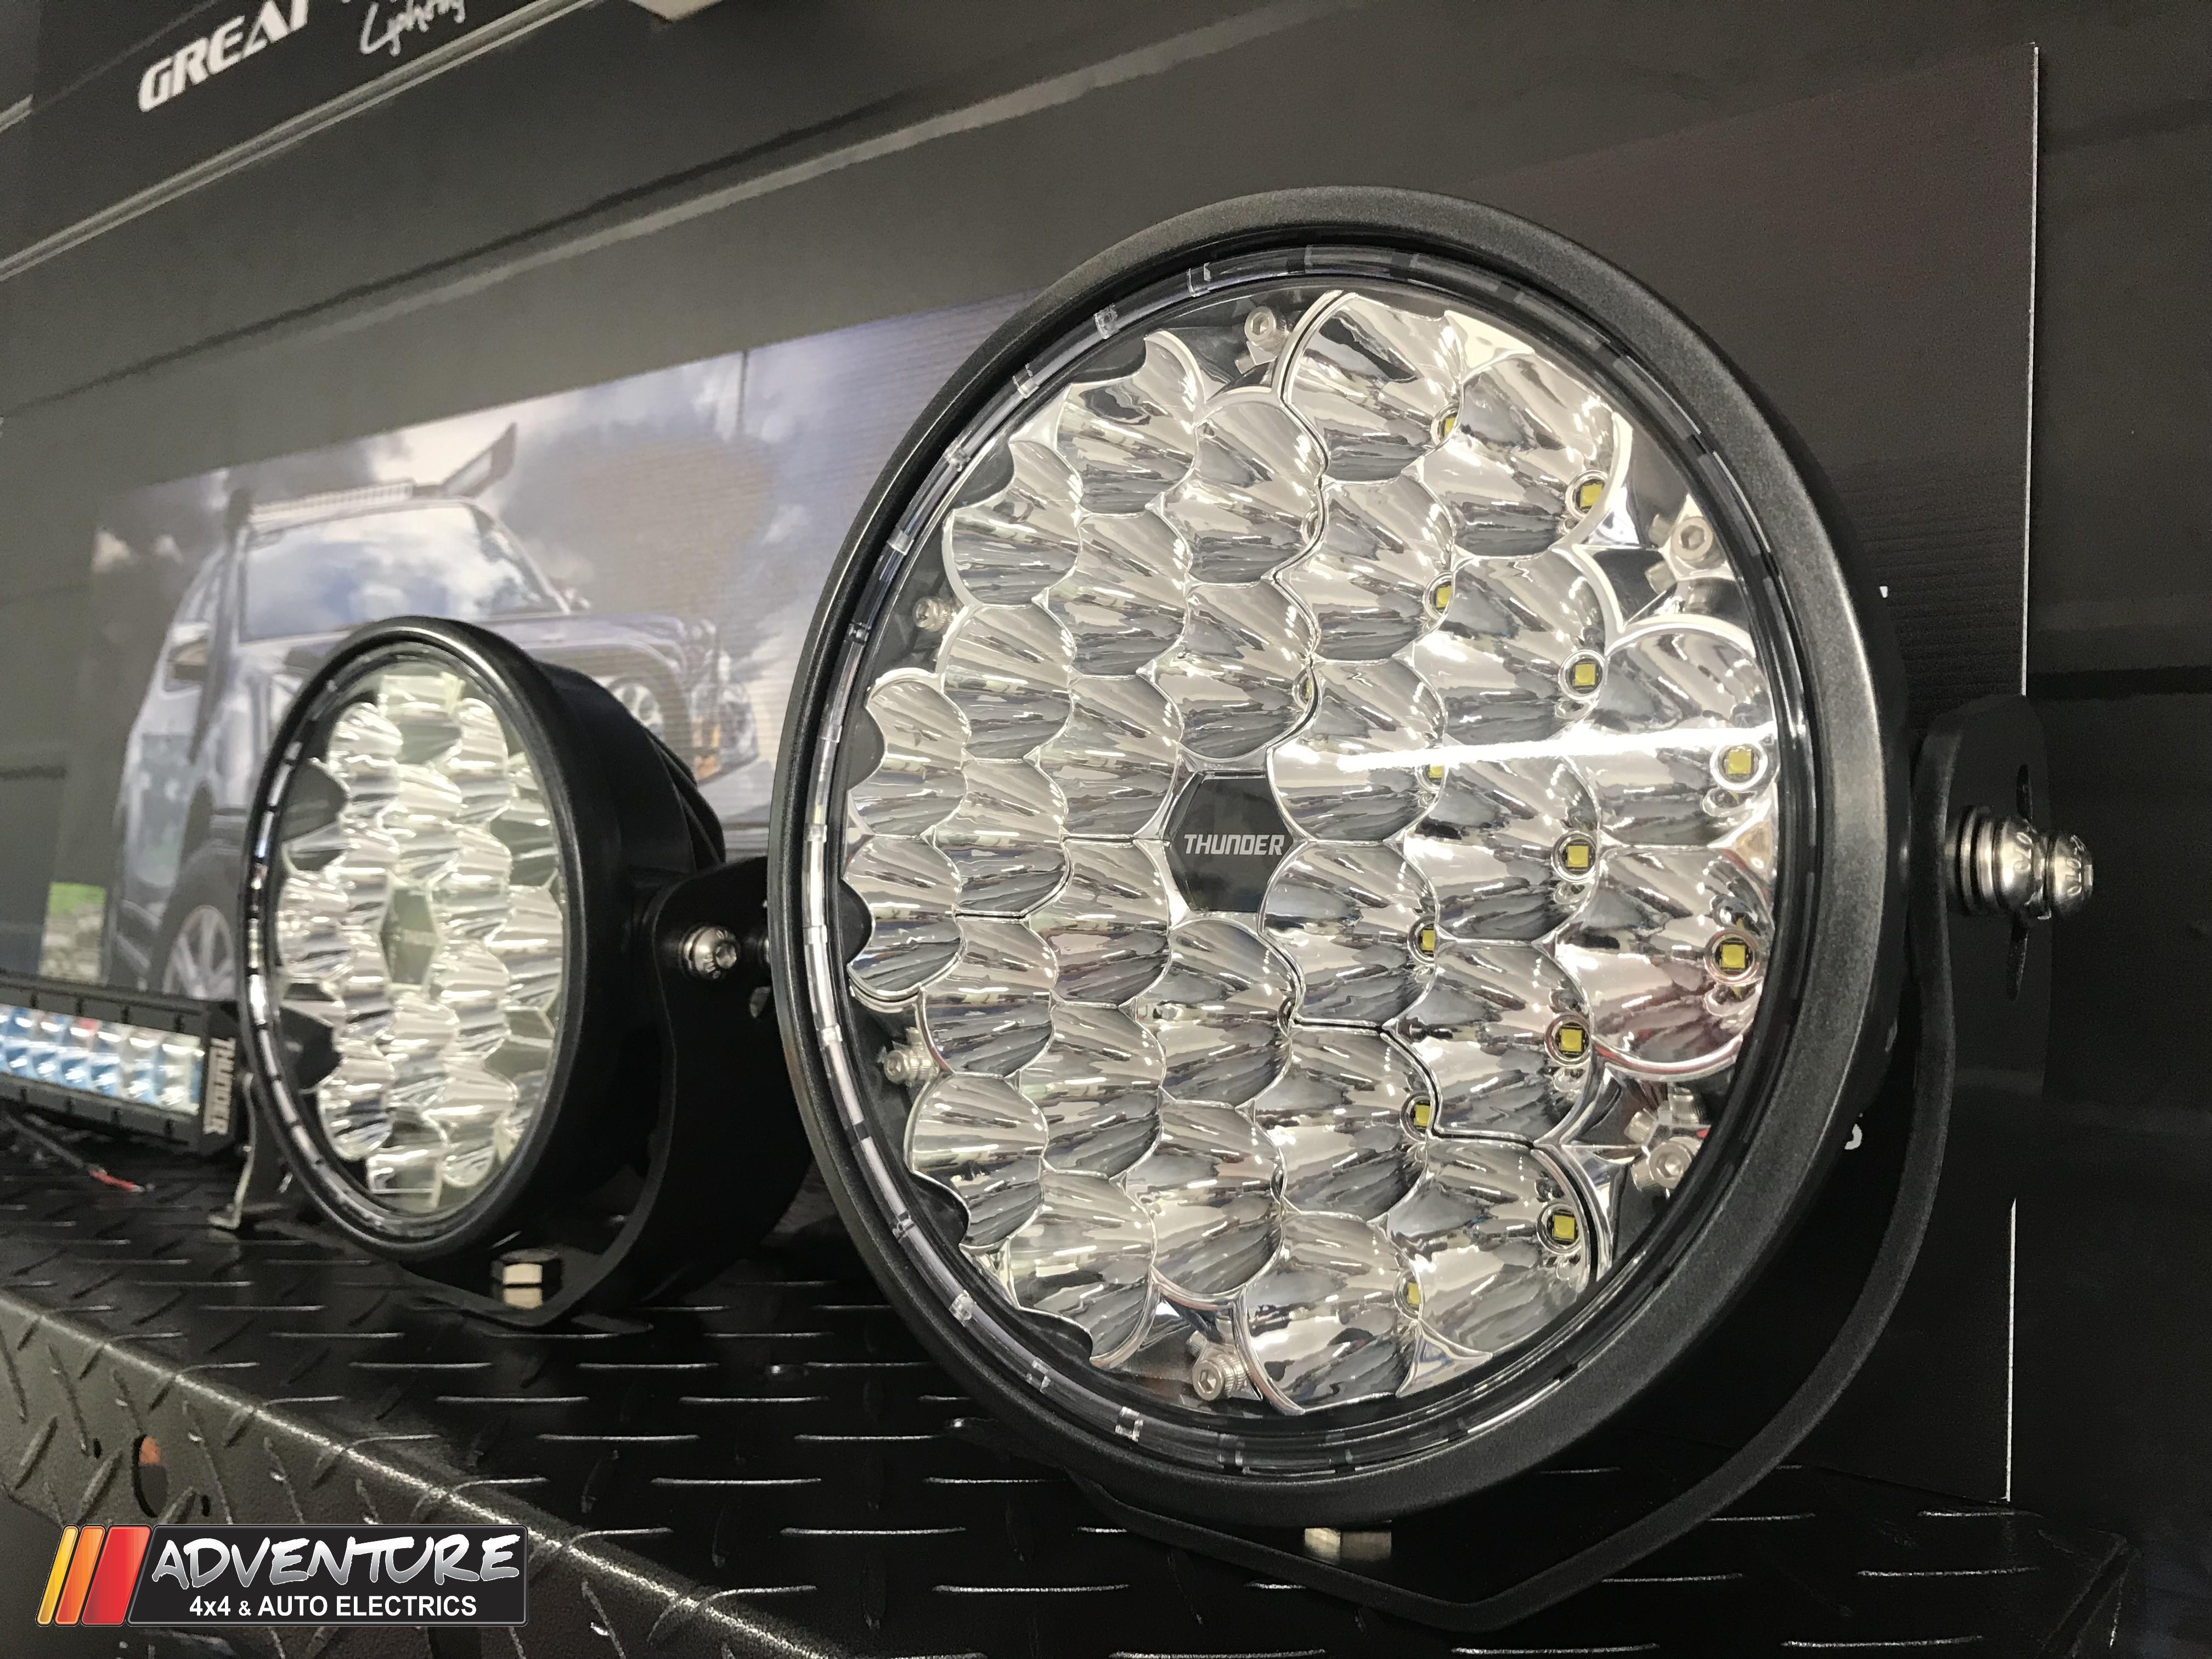 Roadvision Thunder Lighting Adventure Auto